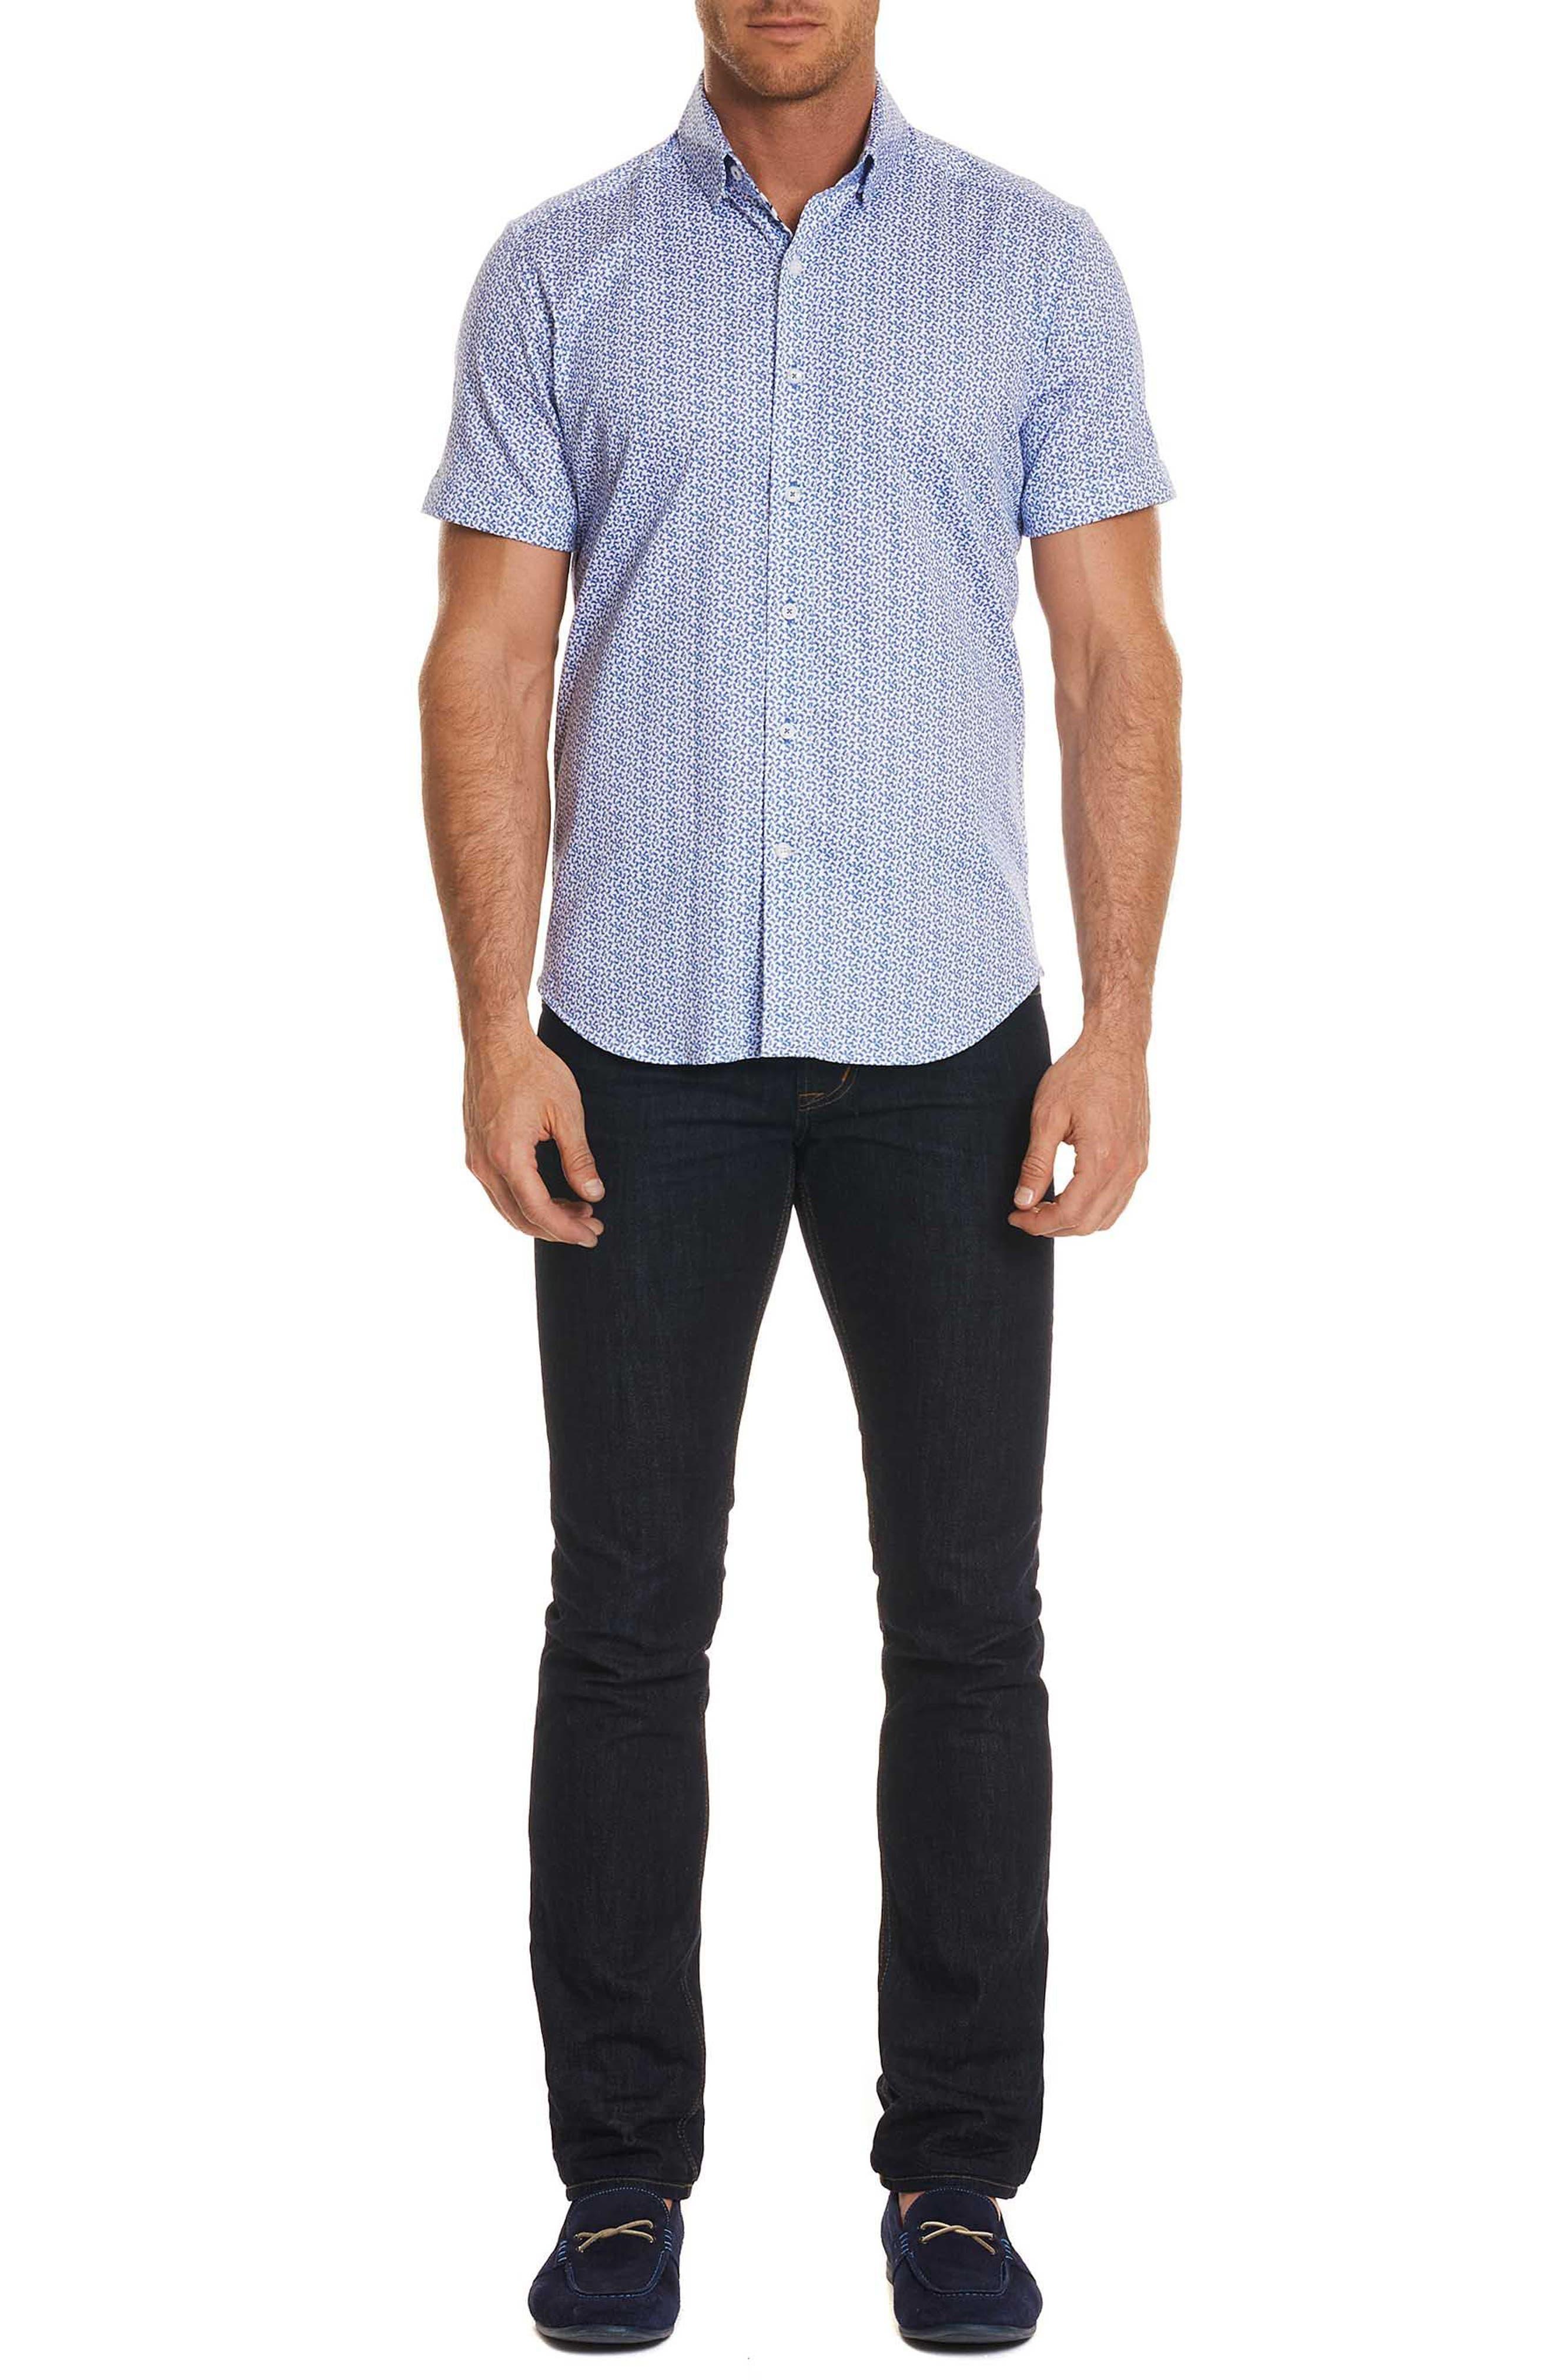 Hartman Tailored Fit Sport Shirt,                             Alternate thumbnail 6, color,                             Blue